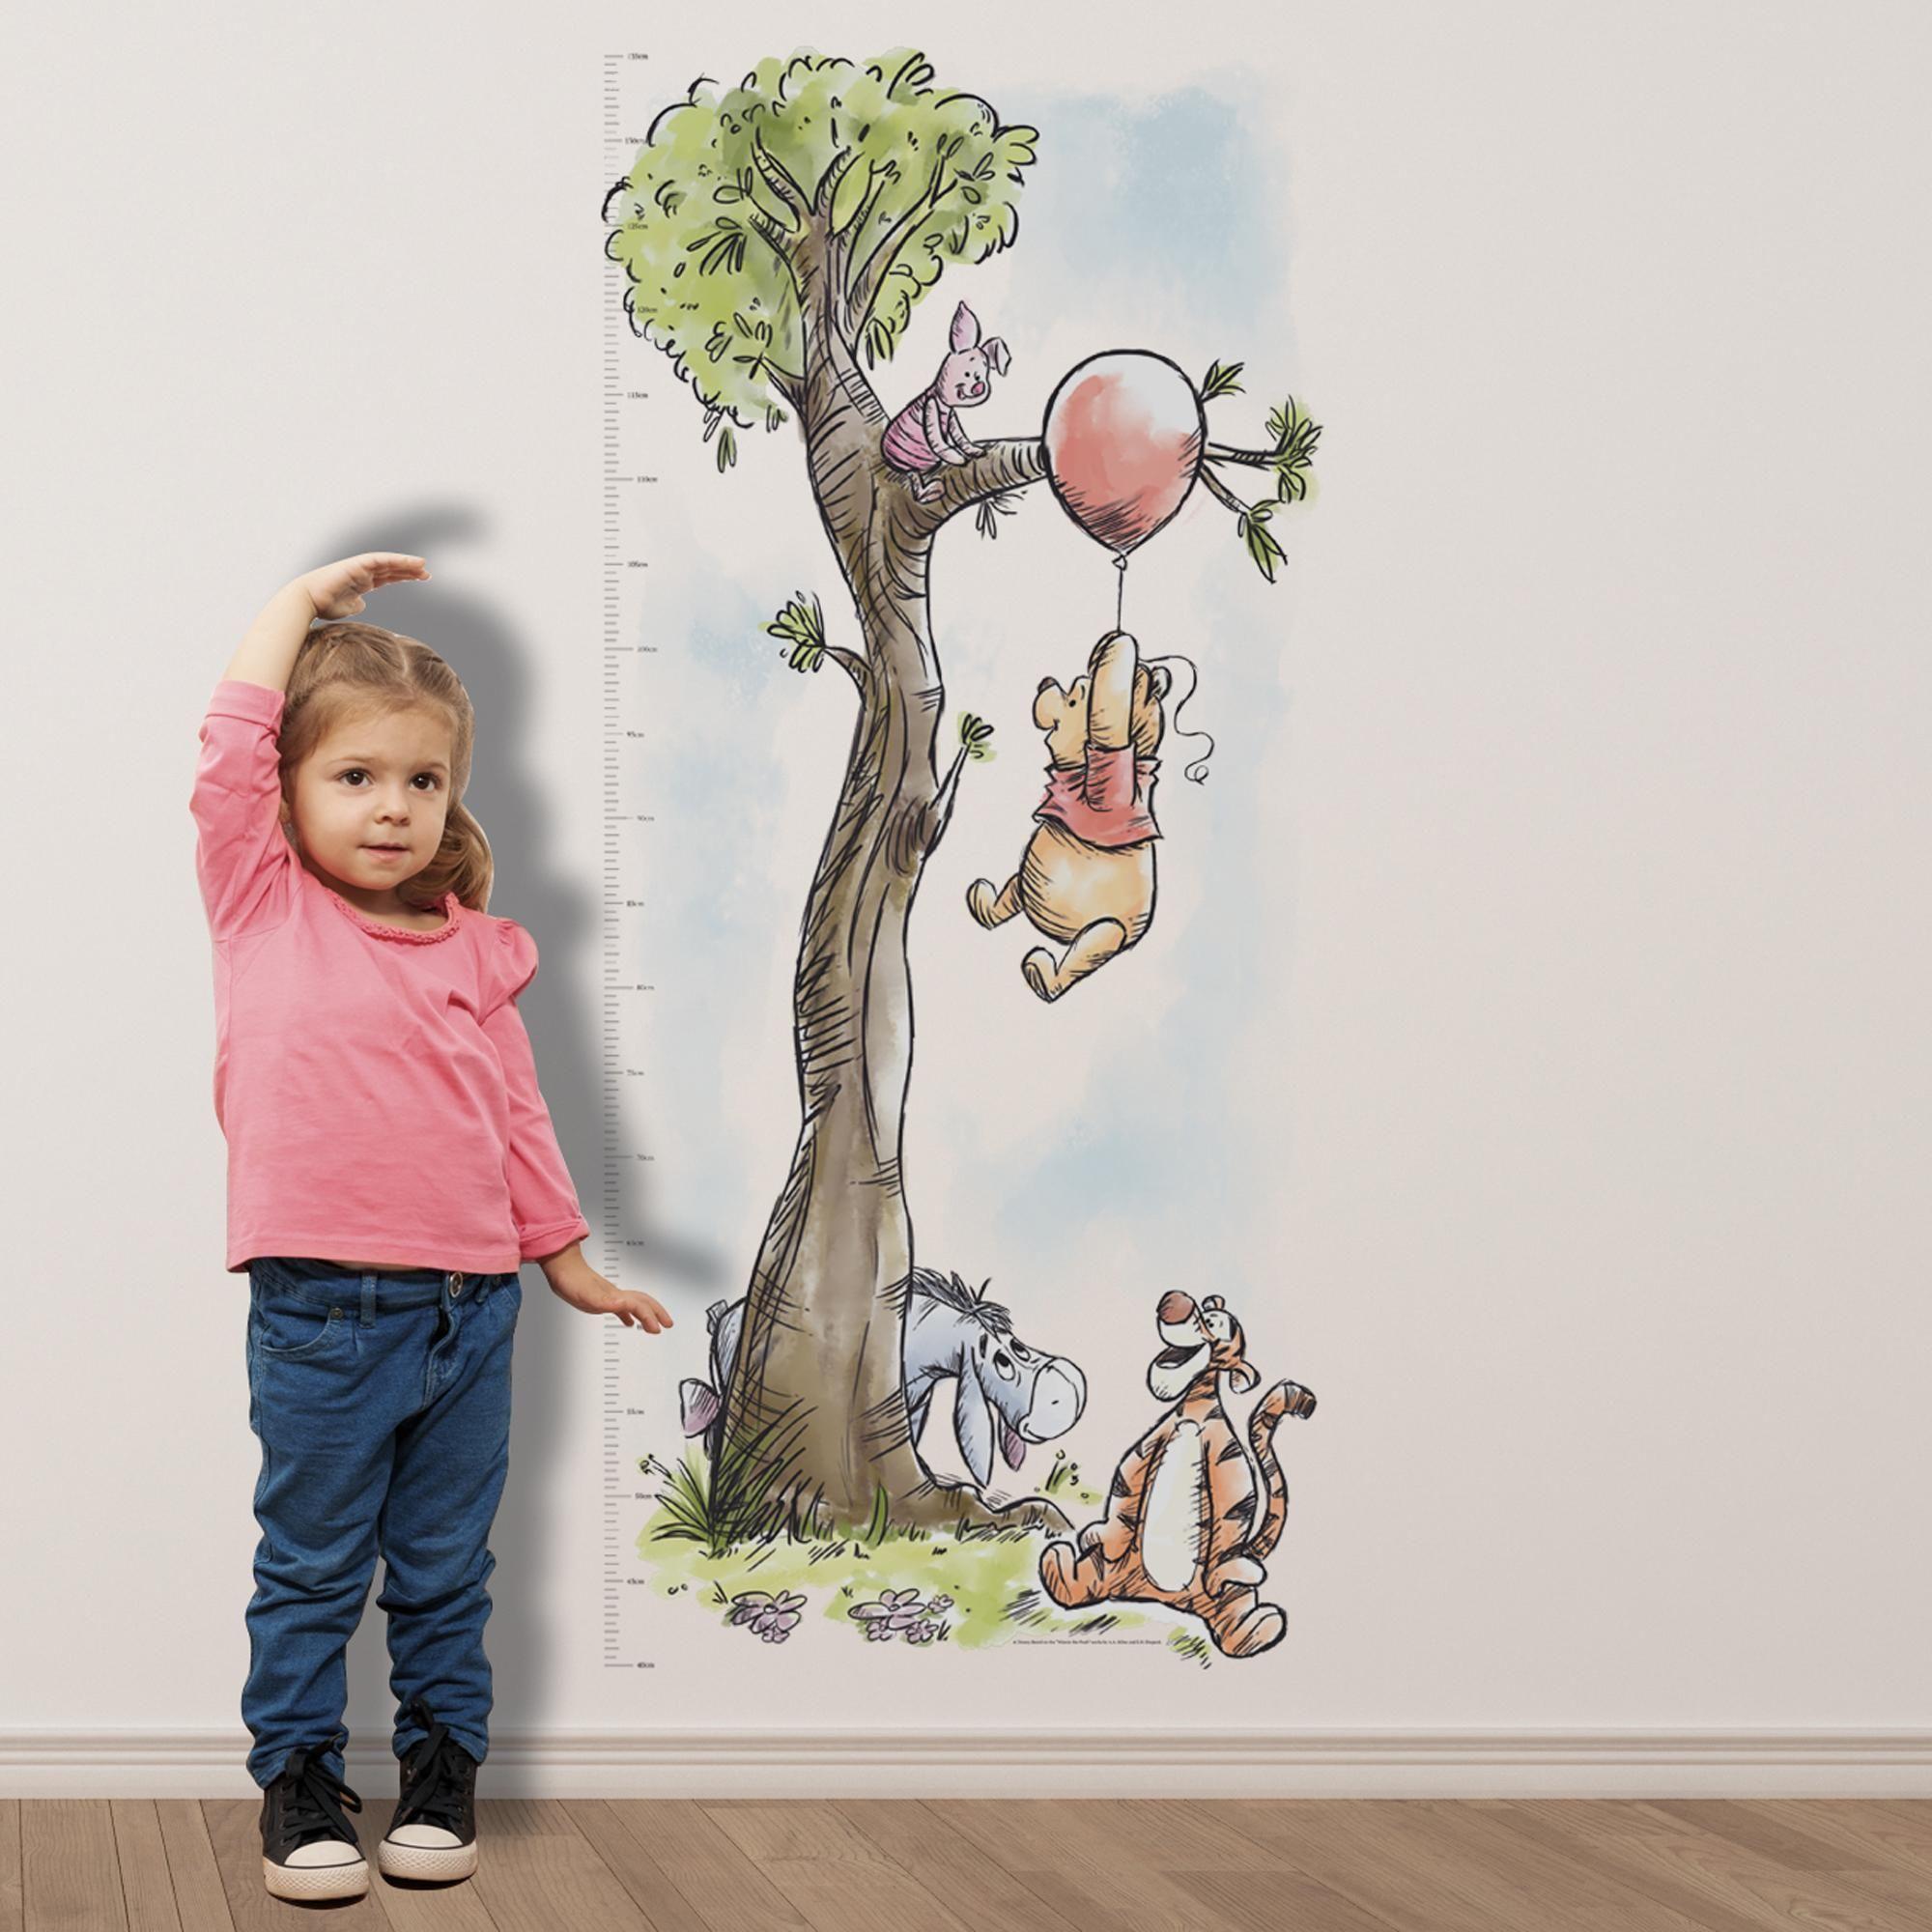 Disney Winnie The Pooh Height Chart Sticker Vintage Winnie The Pooh Winnie The Pooh Themes Winnie The Pooh Nursery